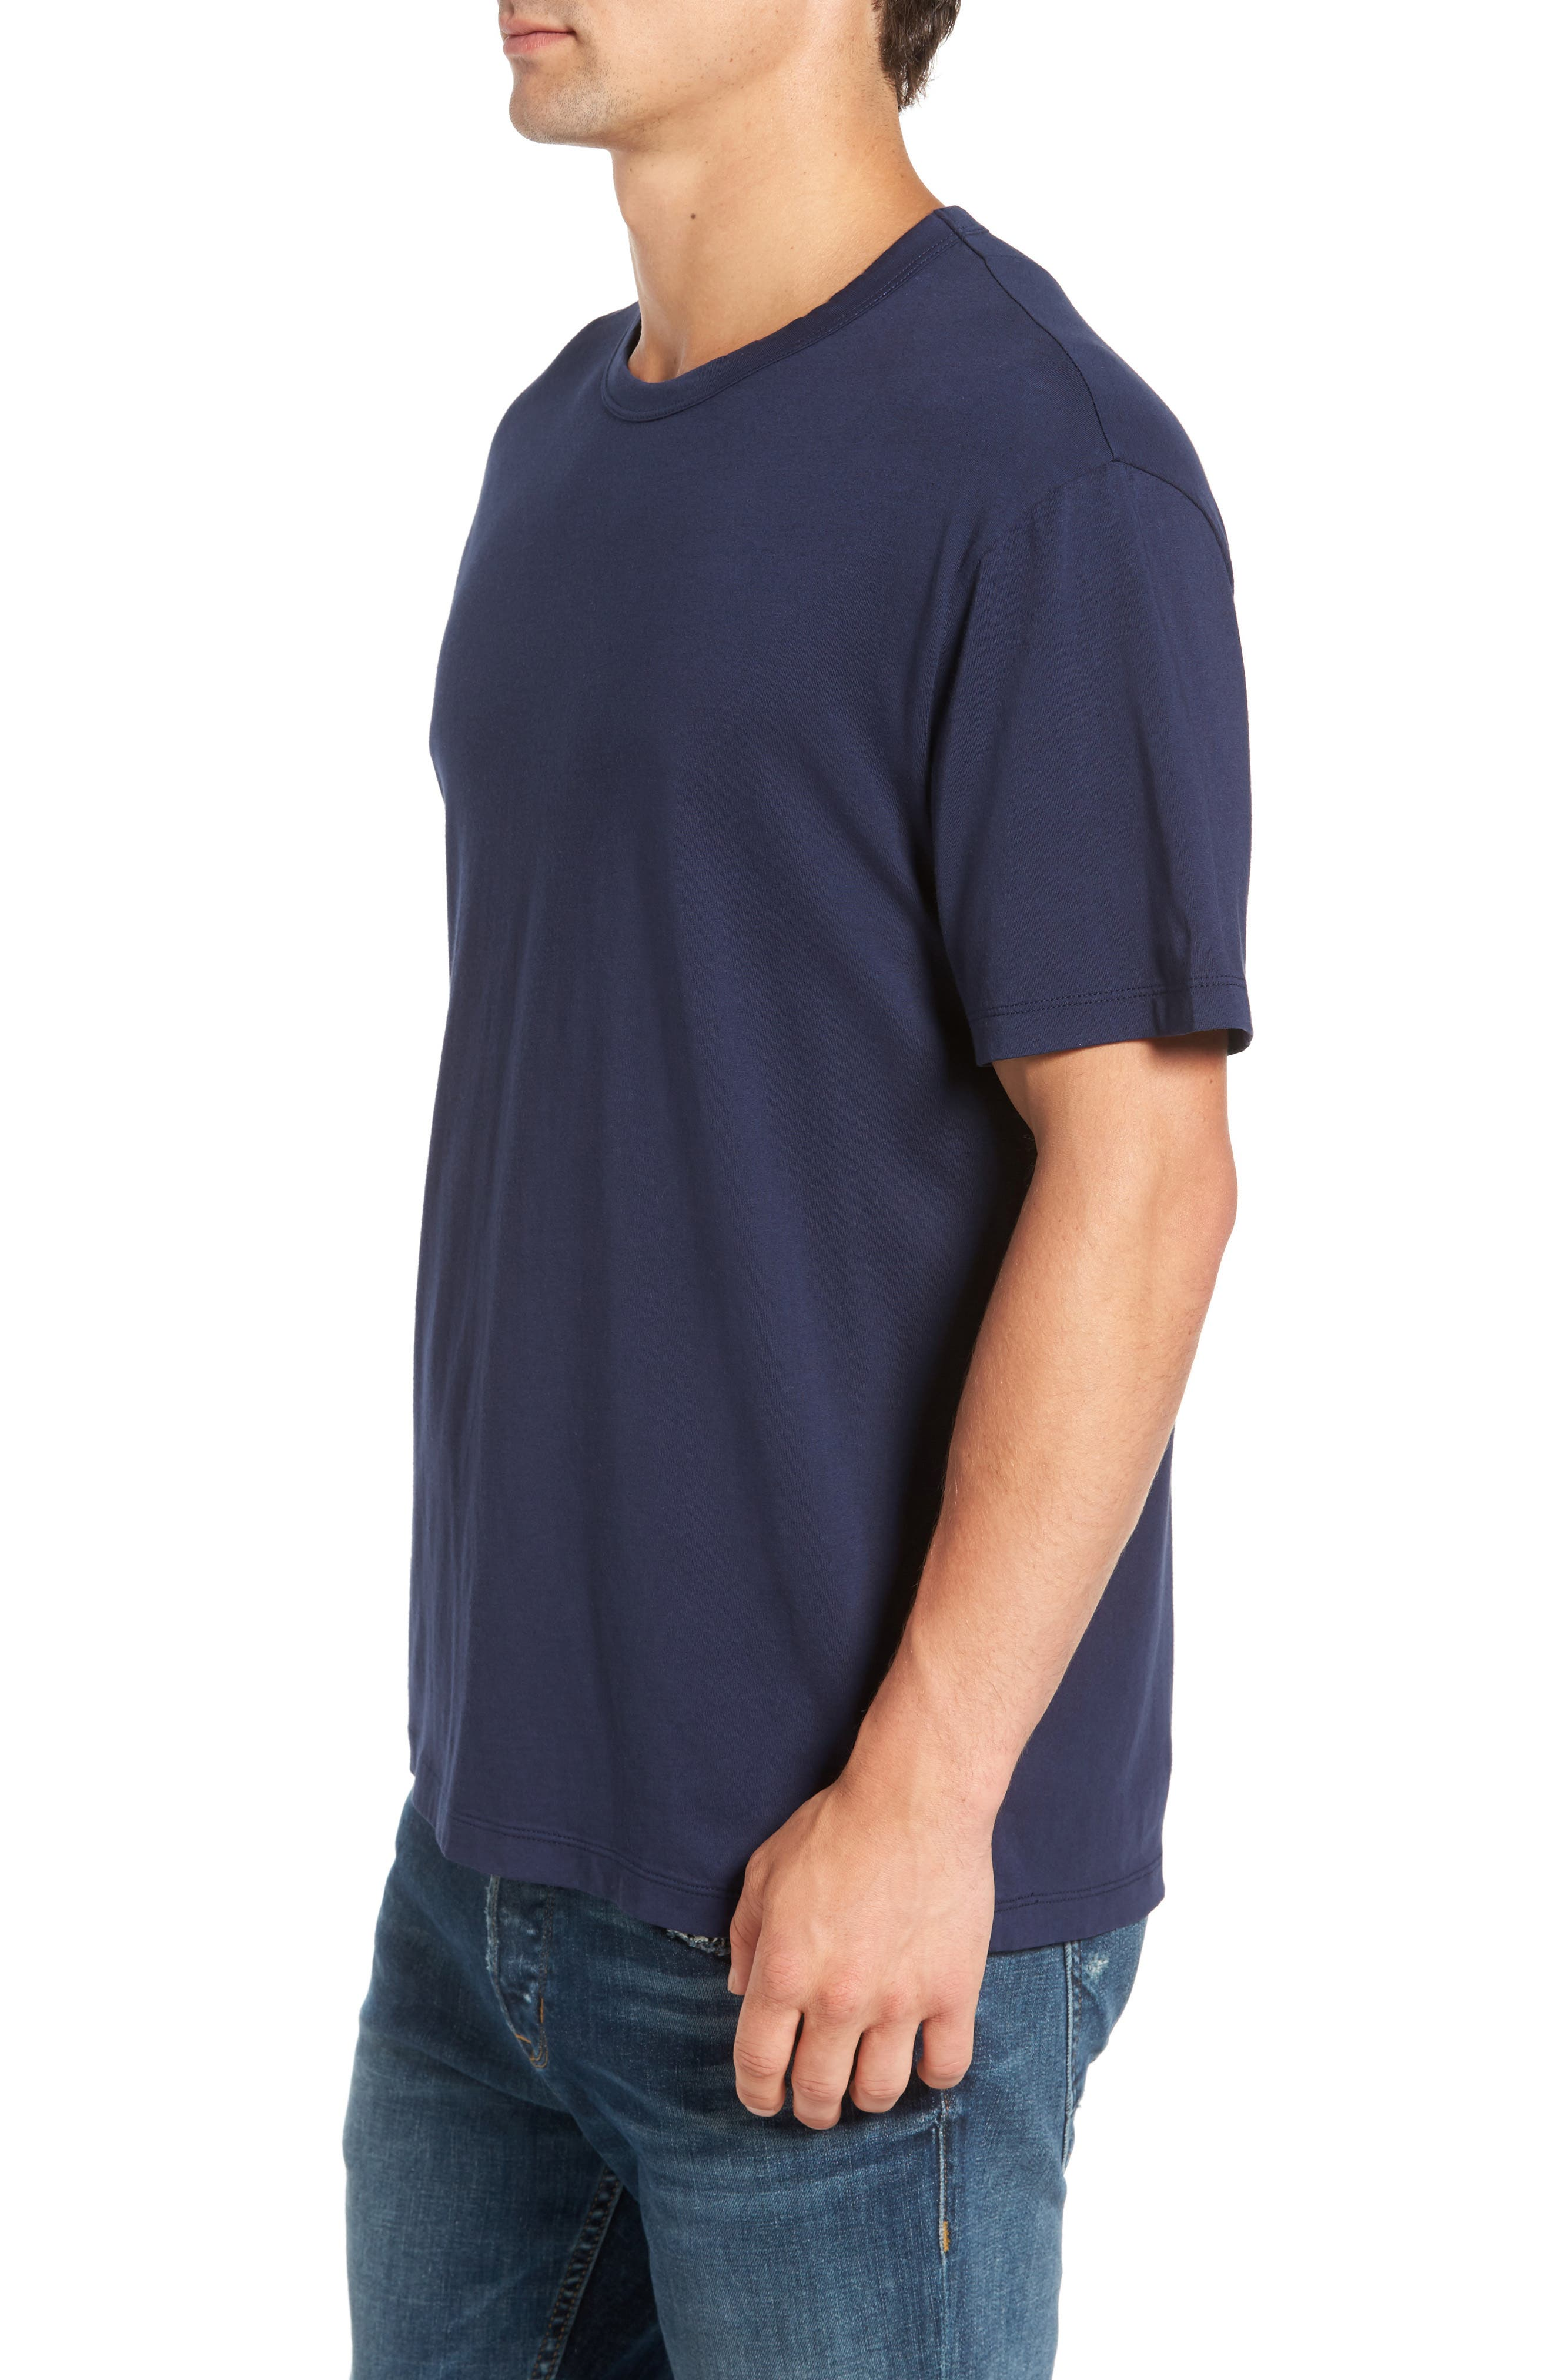 Spinnaker Bay Sports Fit Crewneck T-Shirt,                             Alternate thumbnail 12, color,